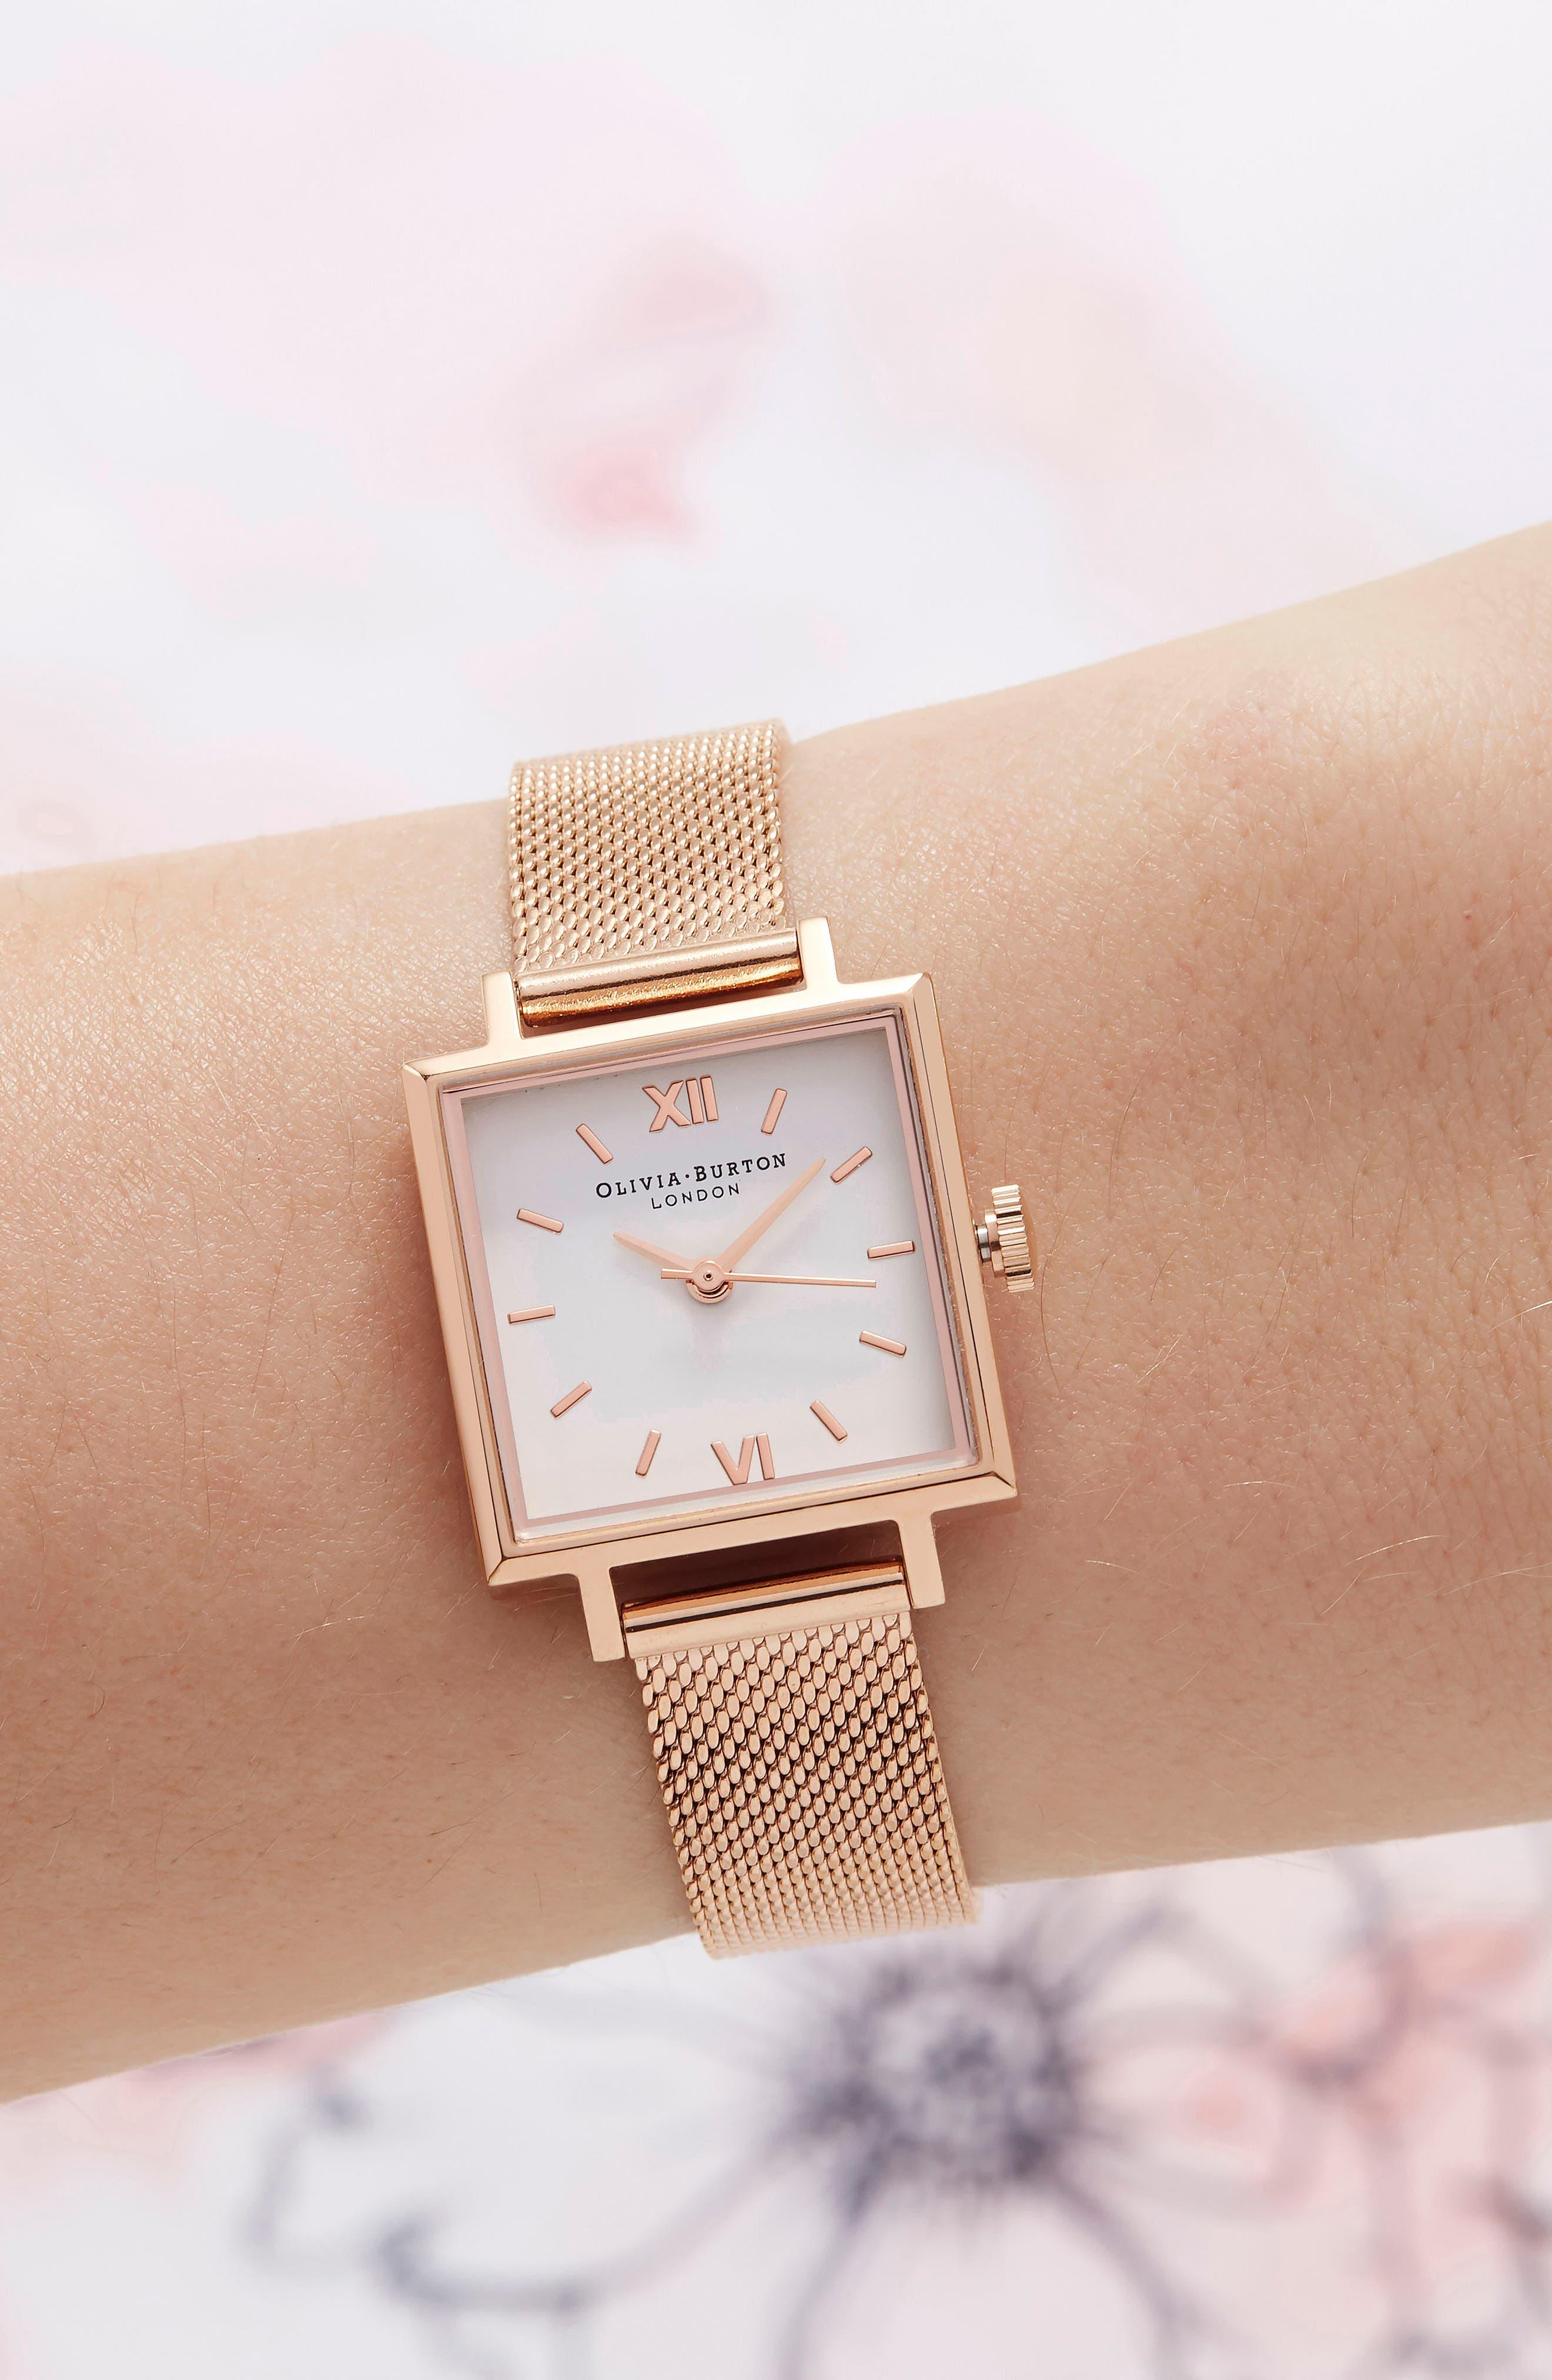 Midi Square Mesh Strap Watch, 22.5mm,                             Alternate thumbnail 4, color,                             Rose Gold/ White/ Rose Gold